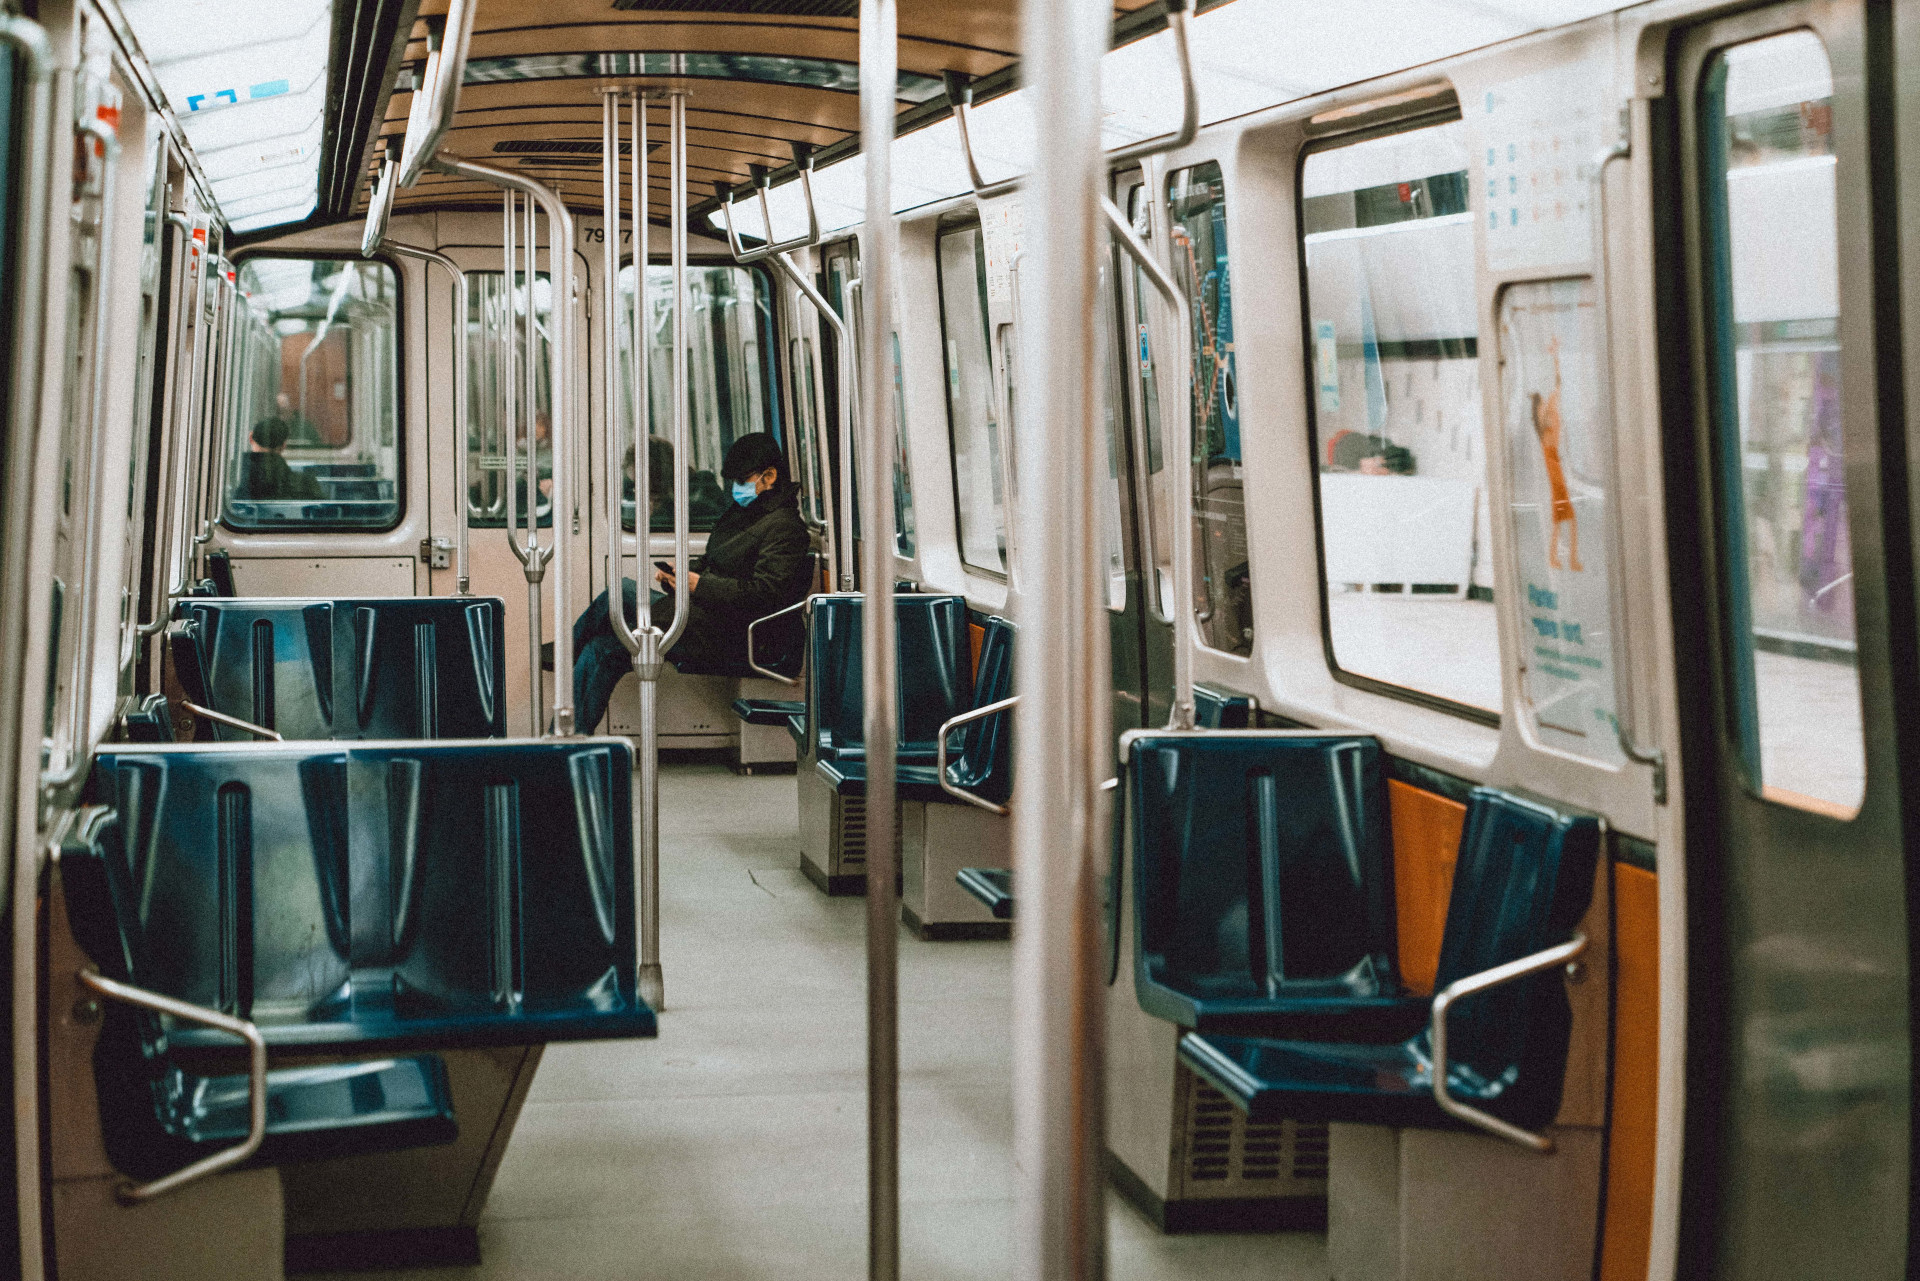 Inside a metro wagon